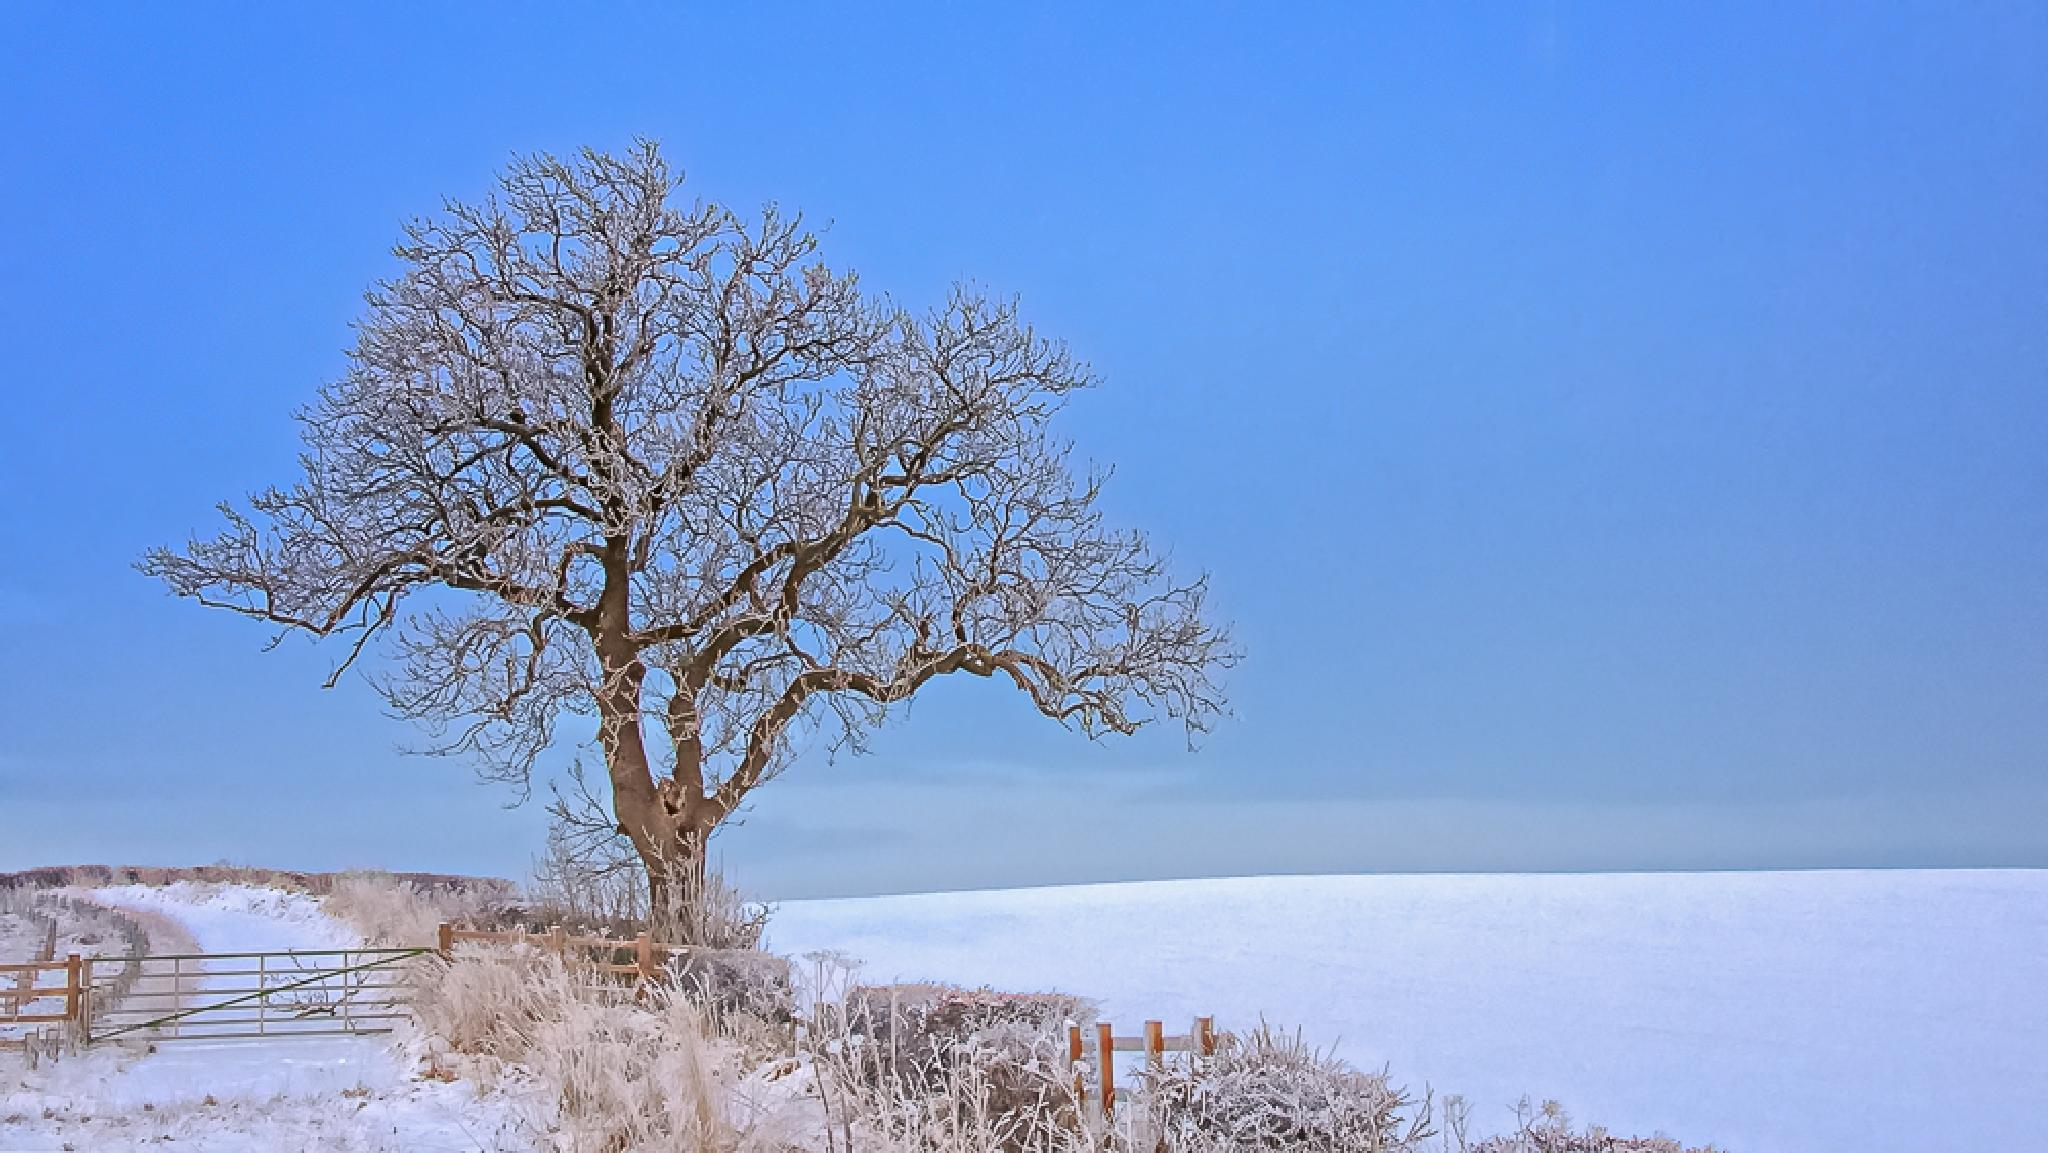 Winter Scenery - County Durham UK by Chris Bailey